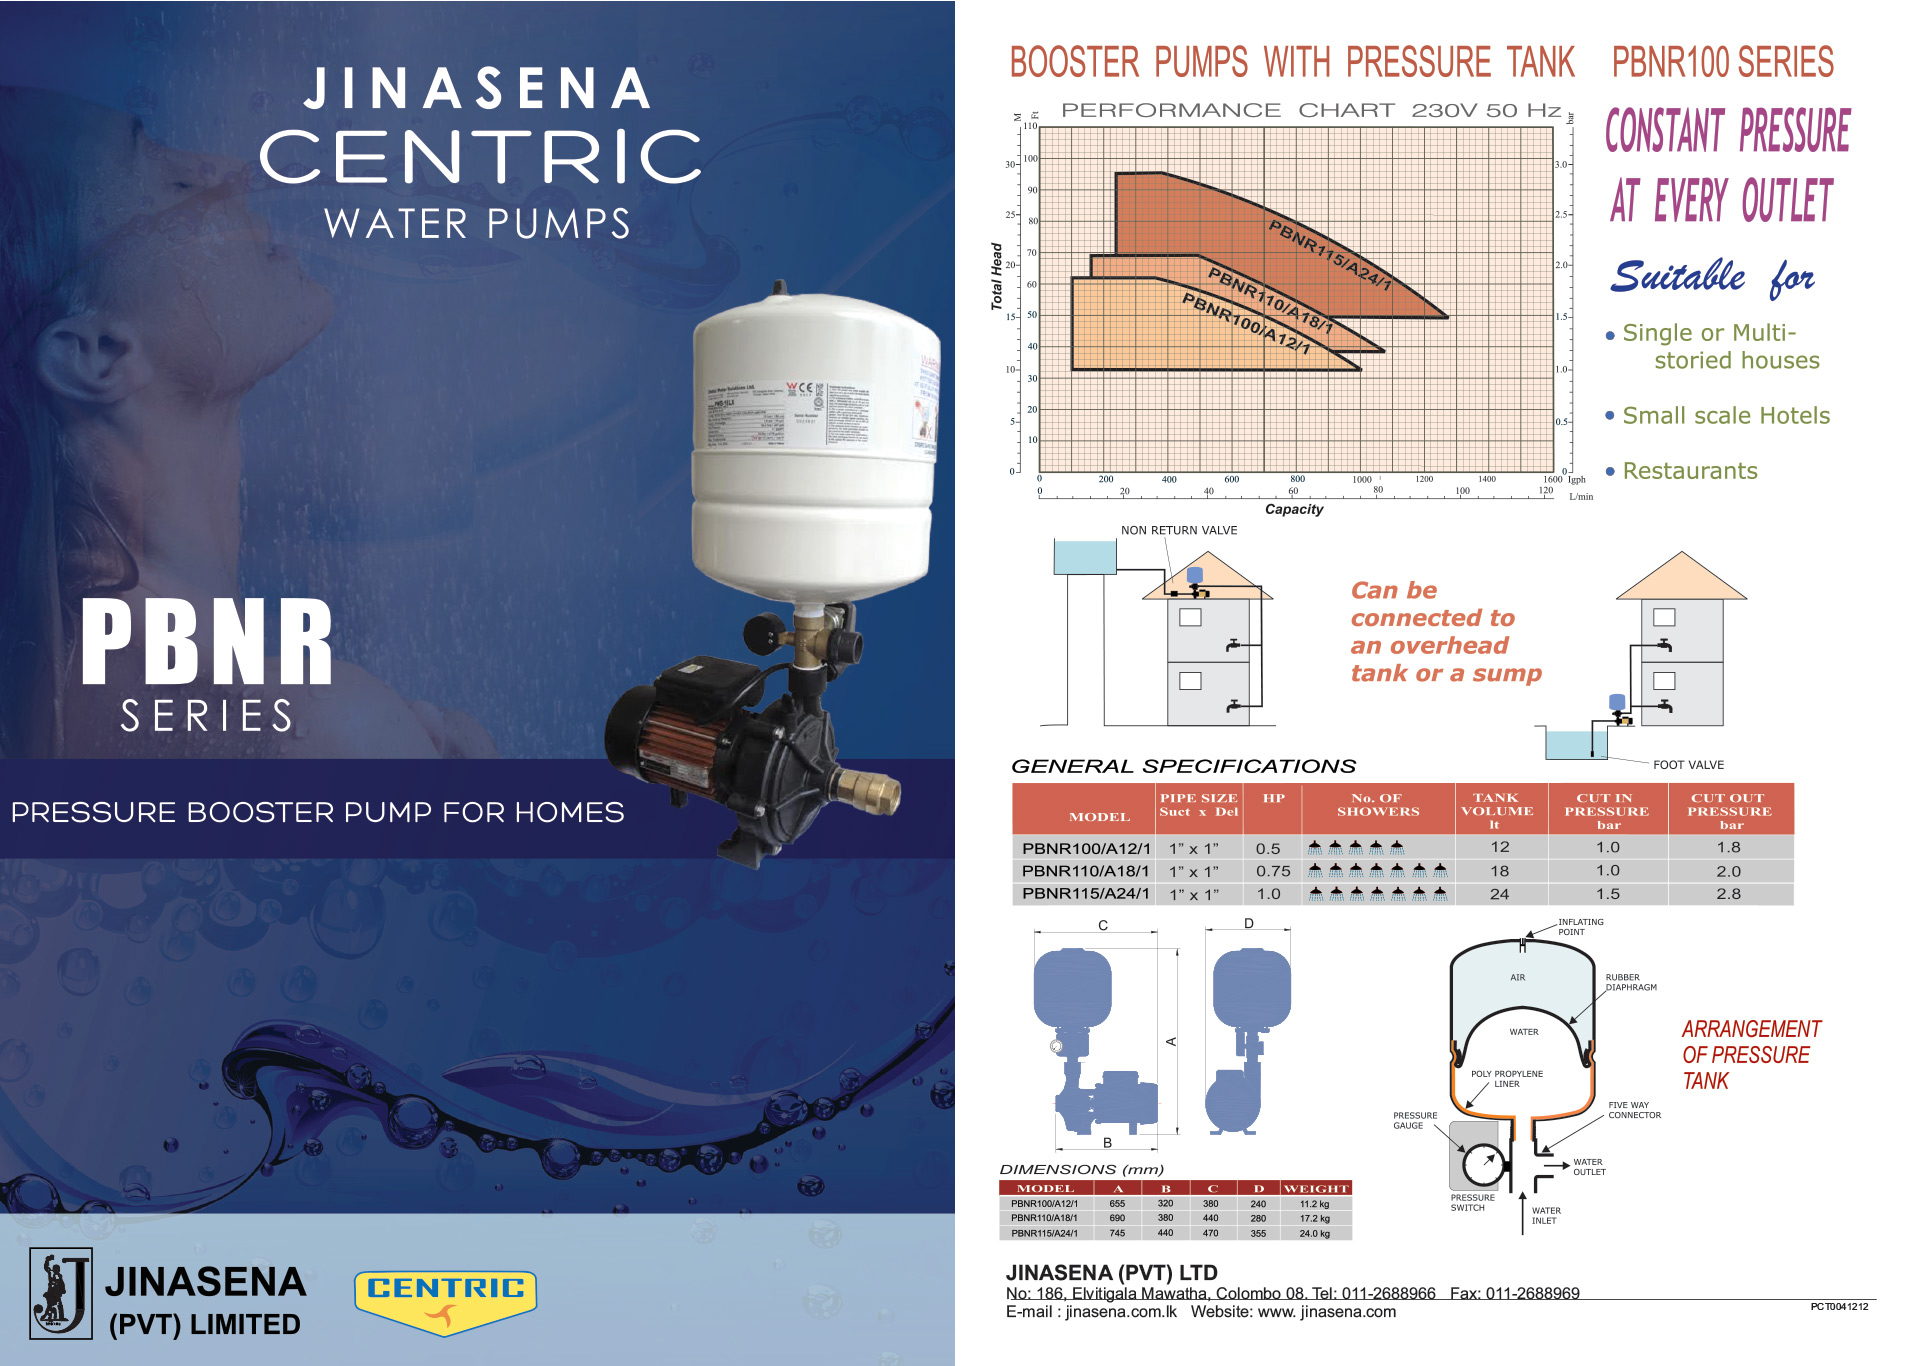 Hot Water Pump >> JINASENA - WATER PUMPS IN SRI LANKA | FG - DOMESTIC PUMPS